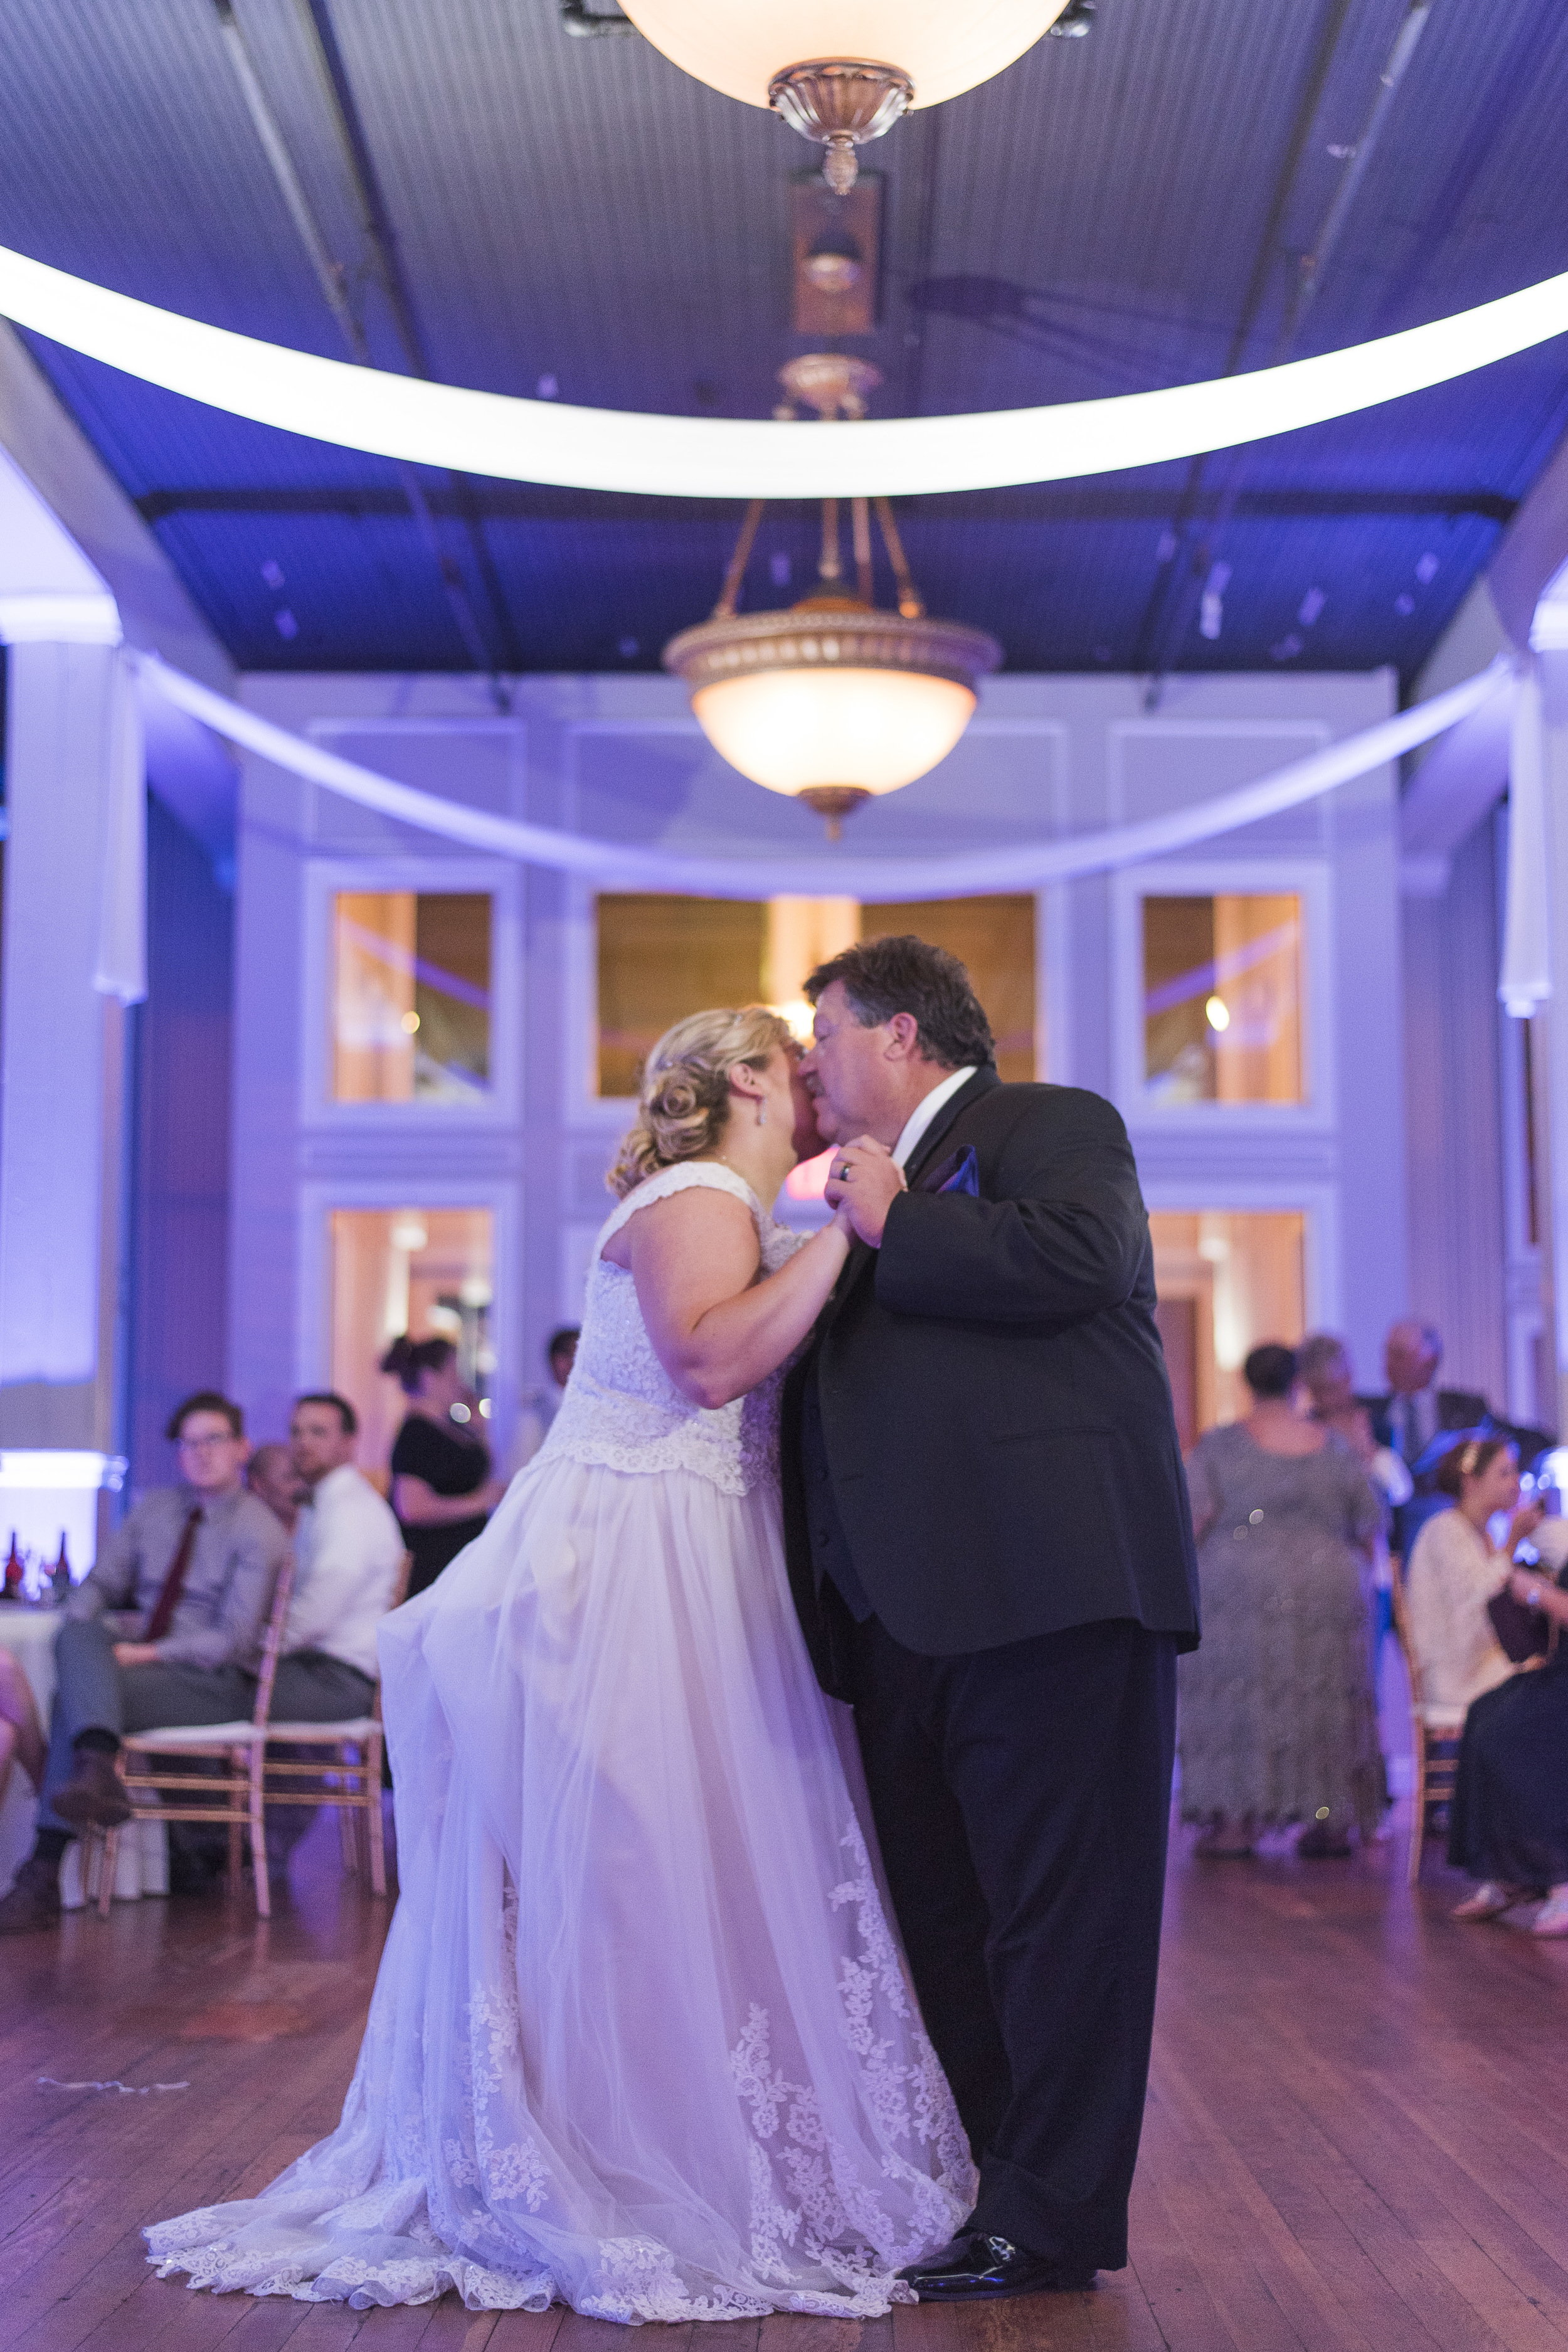 Lynchburg_VA_Wedding_Tresca on 8th_Downtown_Purple_elegant_Photos927.jpg